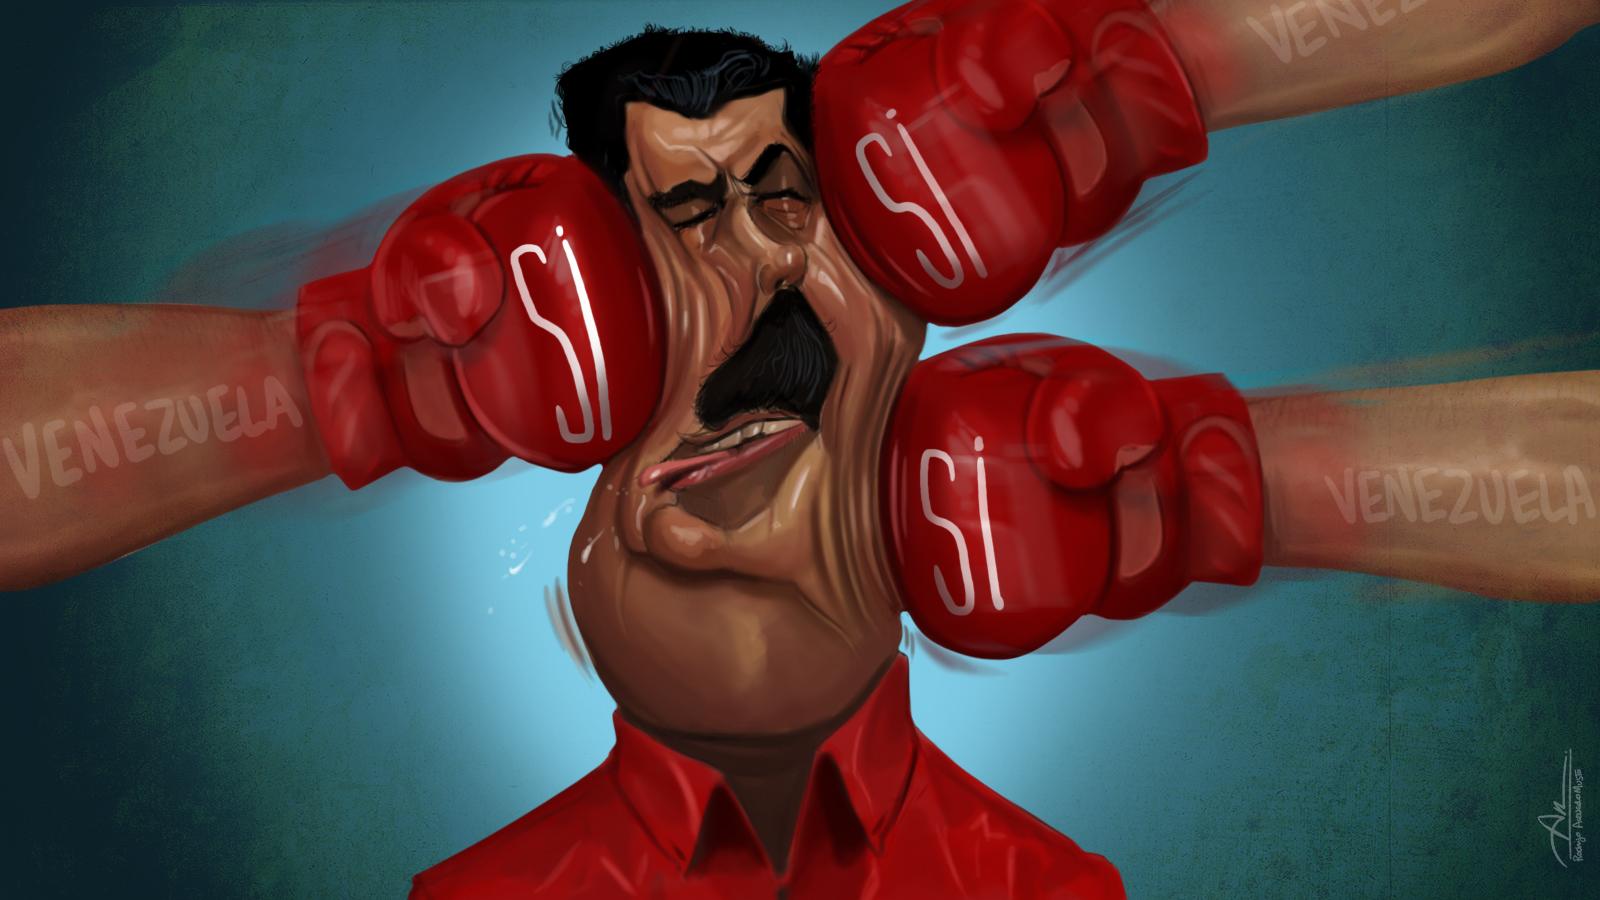 La consulta popular dio un masivo rechazo a la Asamblea Constituyente que pretende imponer Nicolás Maduro